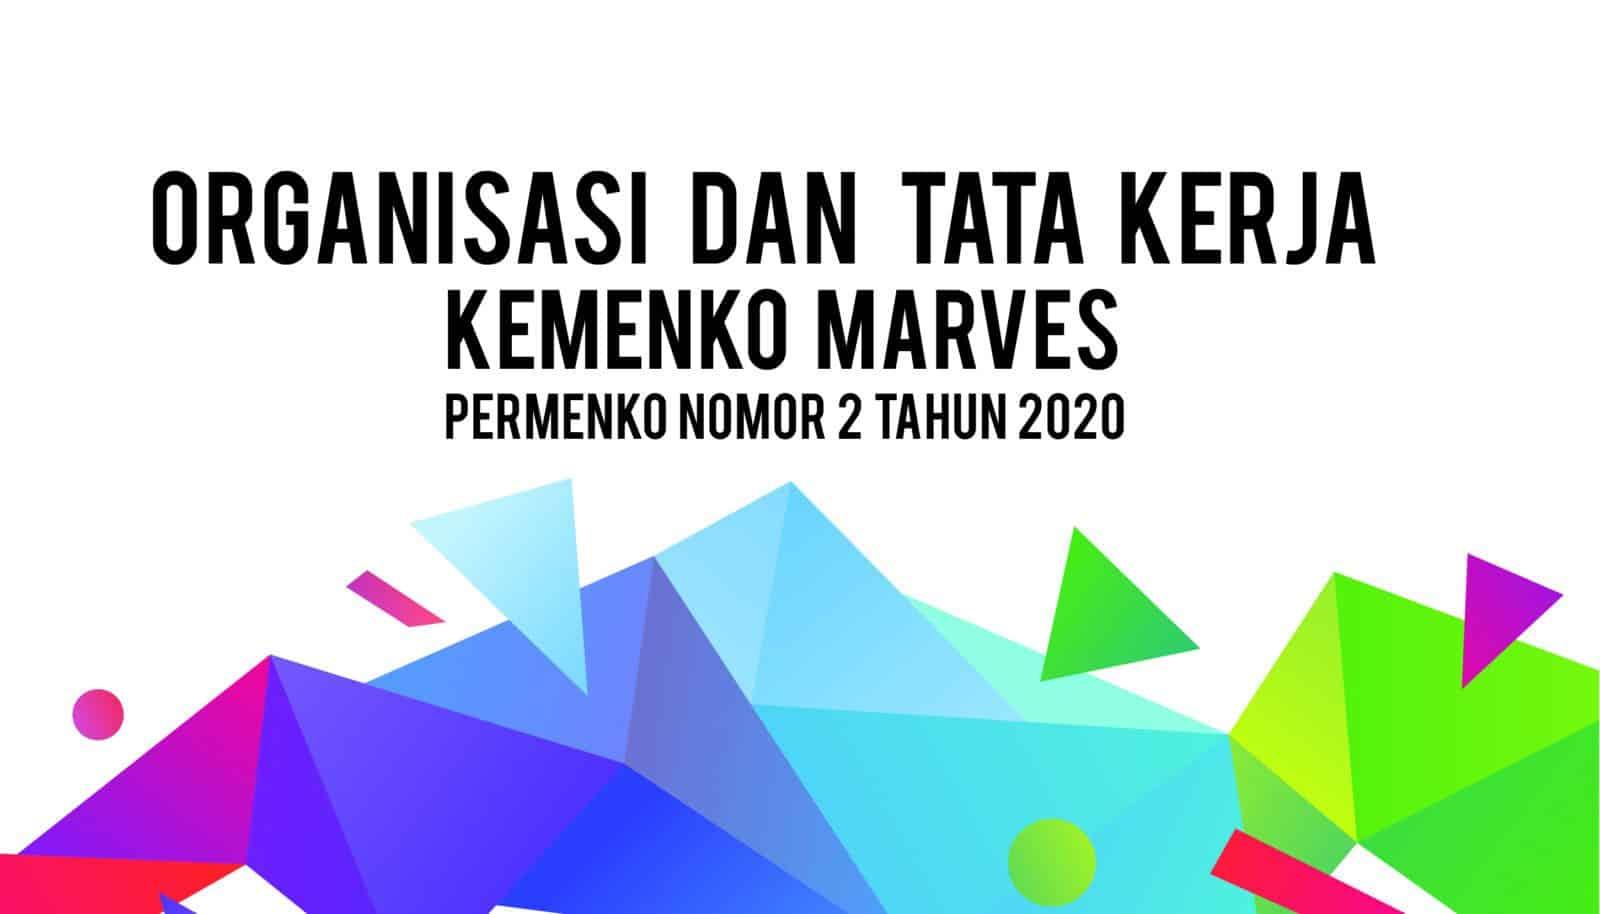 Salinan Permenko Tahun 2020 Tentang Organisasi dan Tata Kerja Kemenko Marves